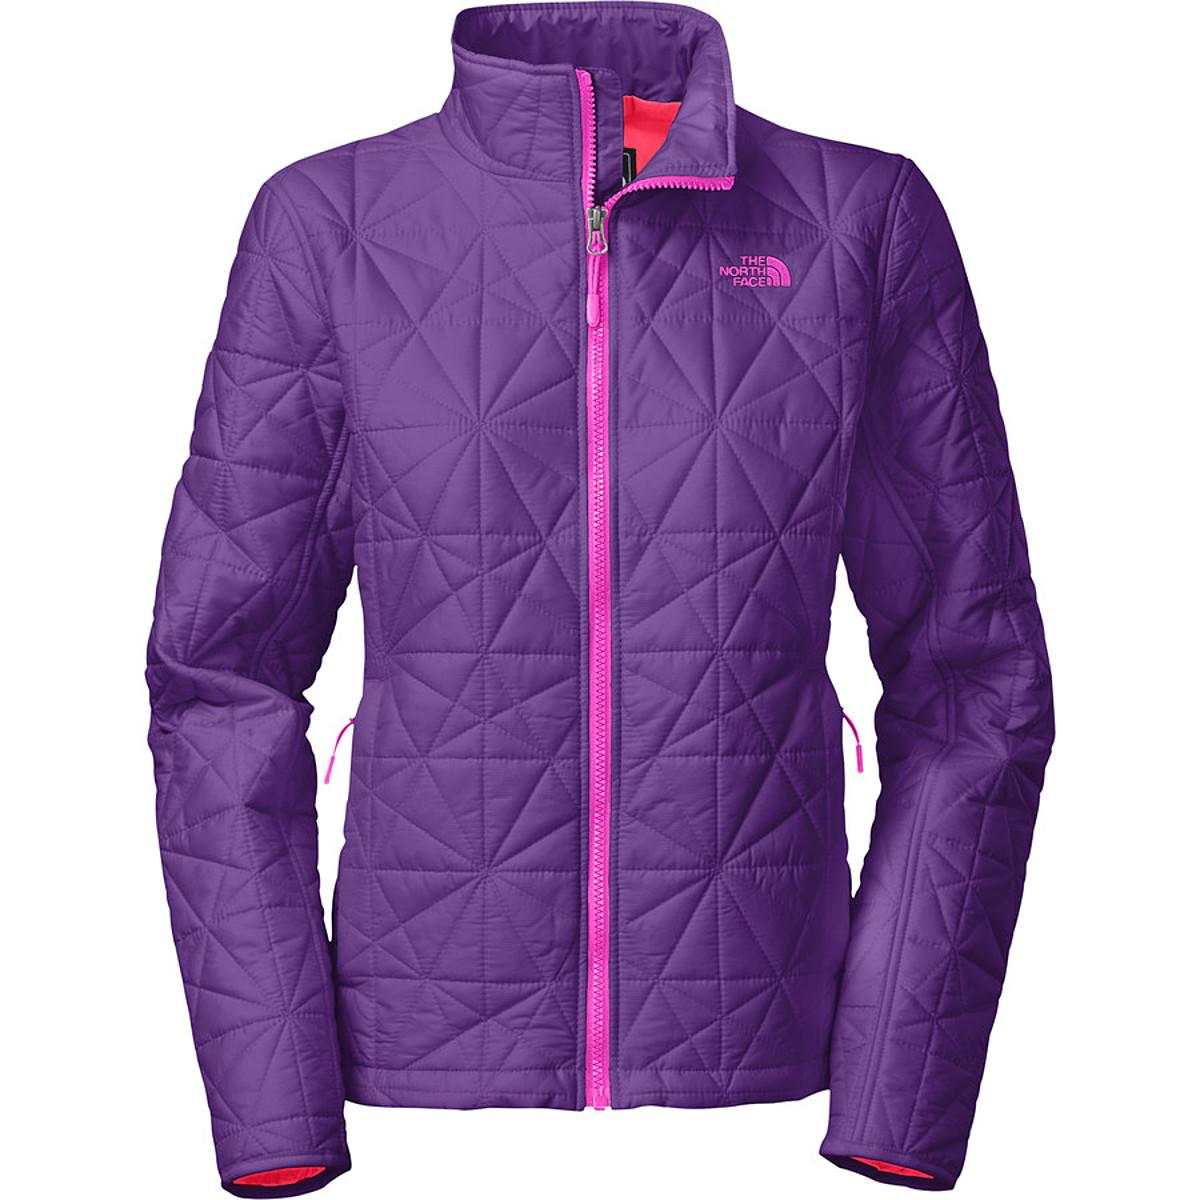 The North Face Tamburello Jacket